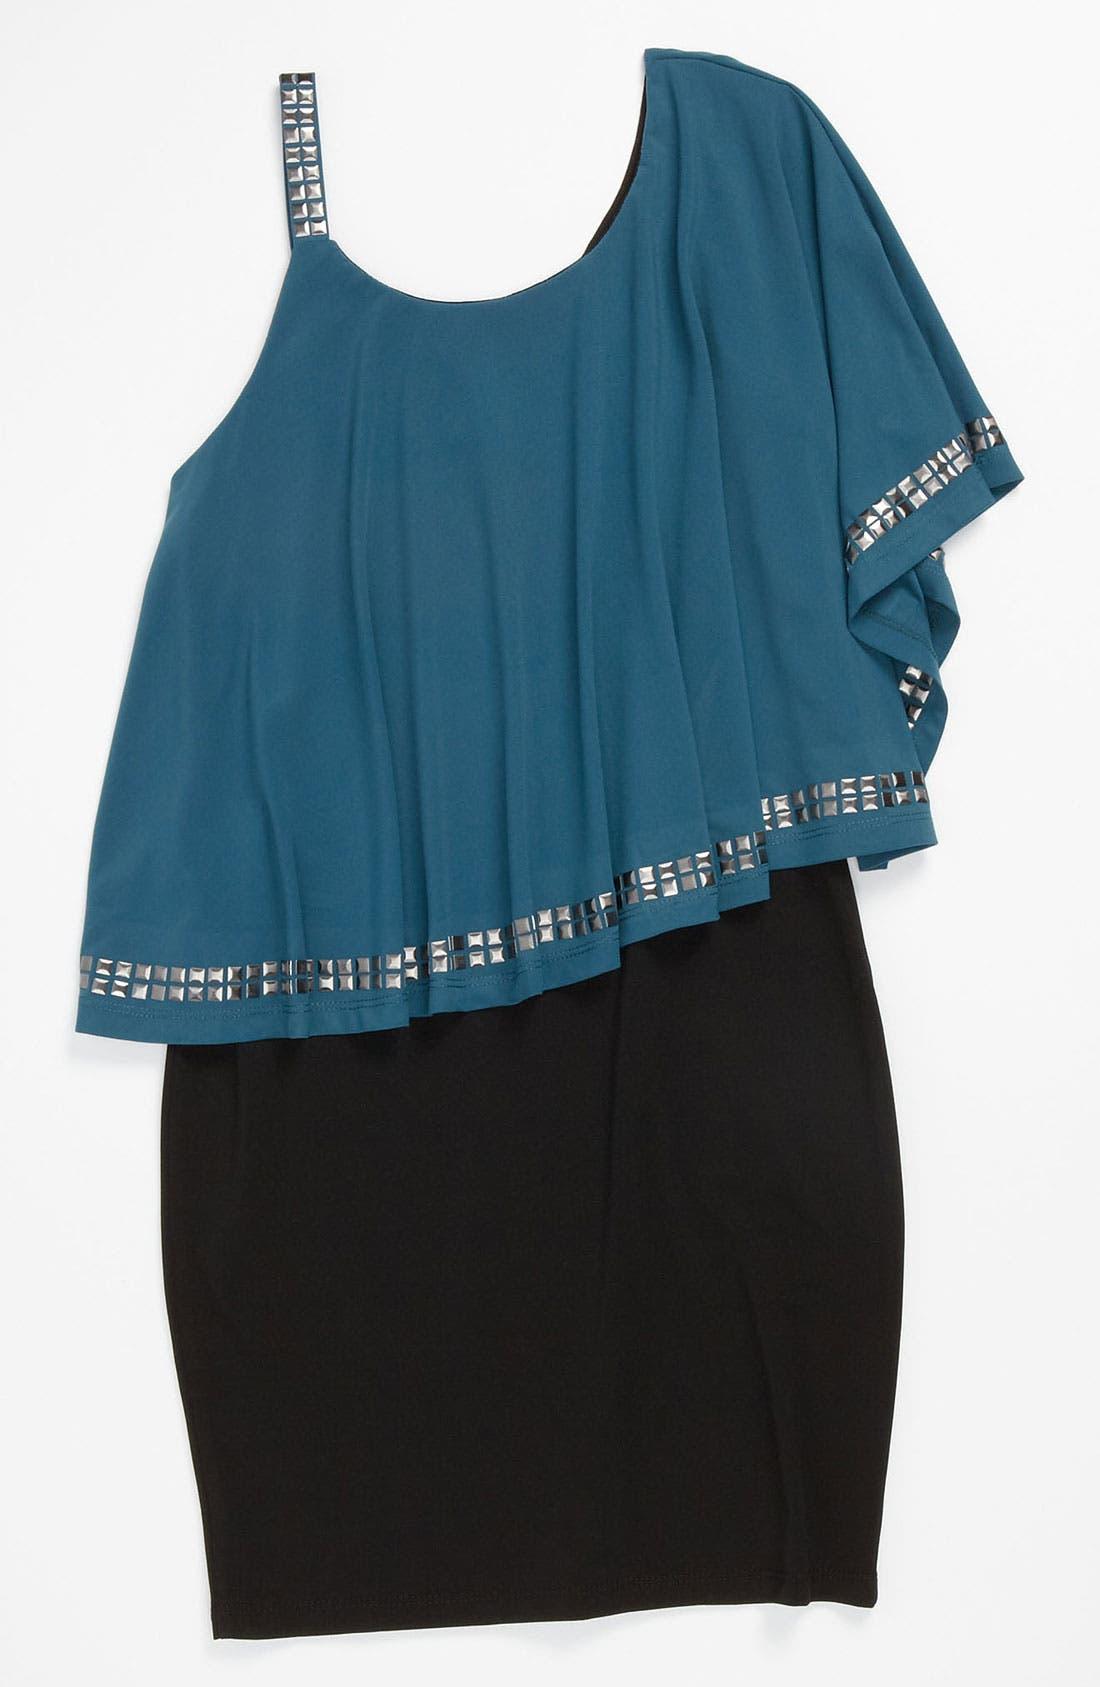 Alternate Image 1 Selected - Elisa B Ruffle Top Dress (Big Girls)